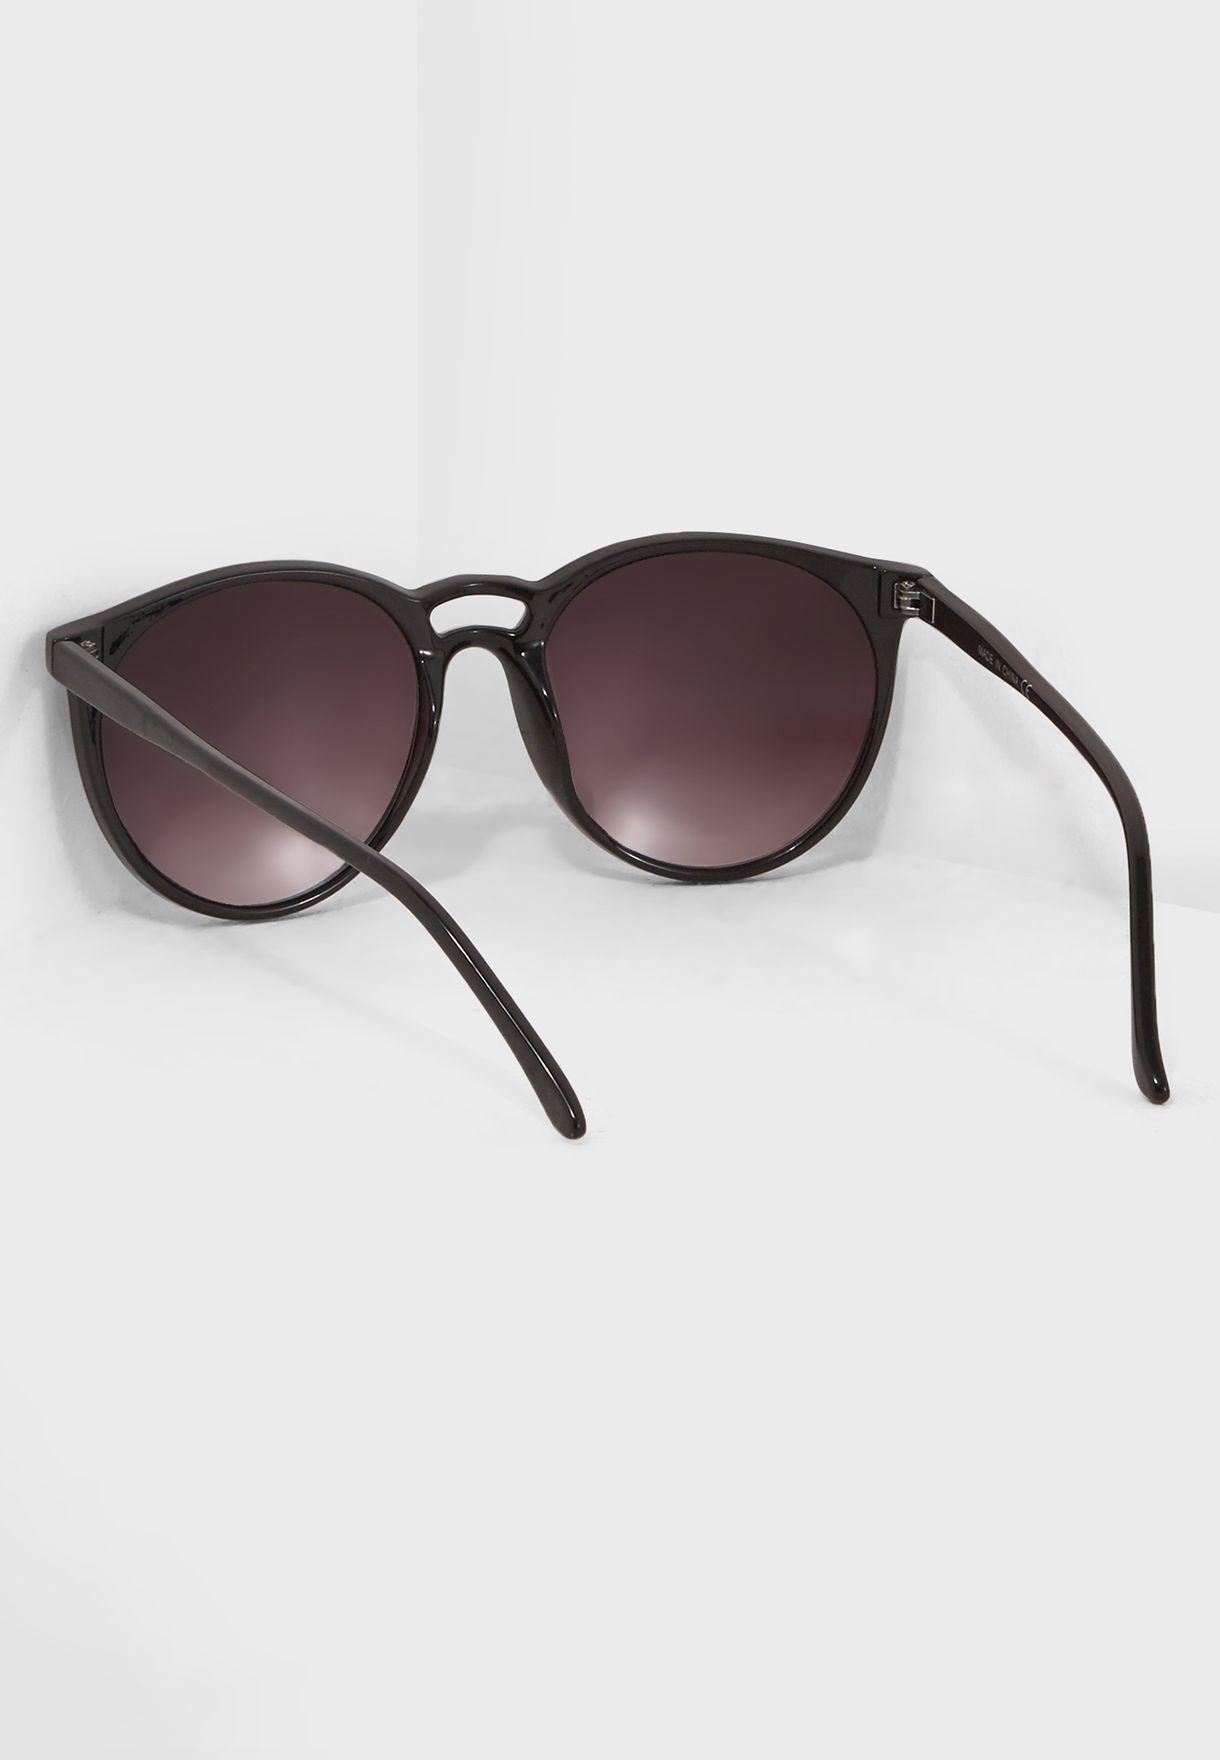 Club Sunglasses